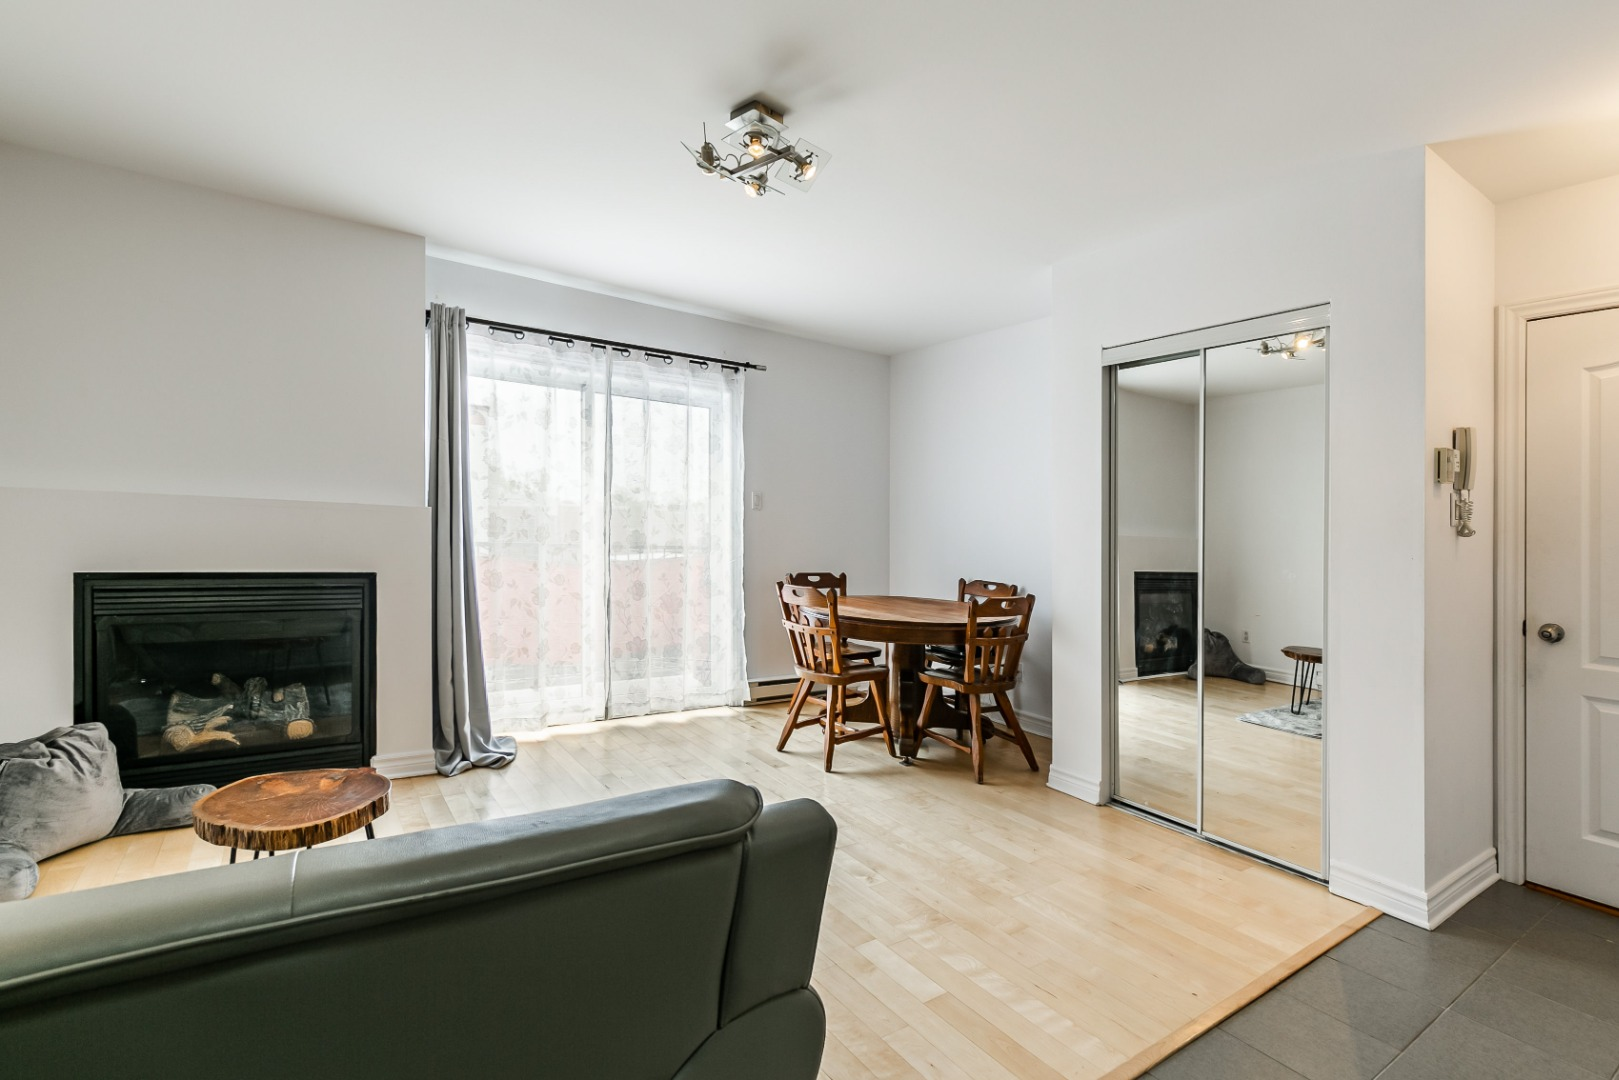 Condo à vendre Villeray 7547 Rue Lajeunesse (5).jpg